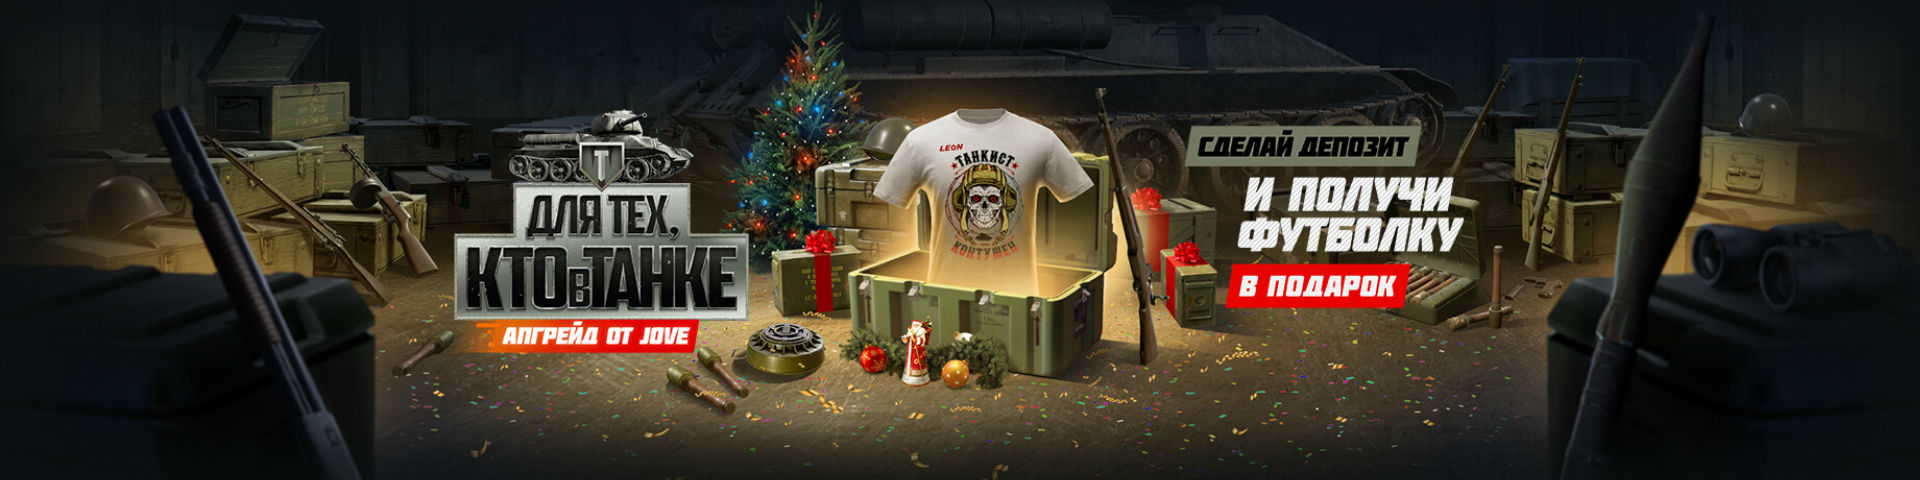 БК «Леон»: футболка для фанатов World of Tanks за депозит 10 000 рублей